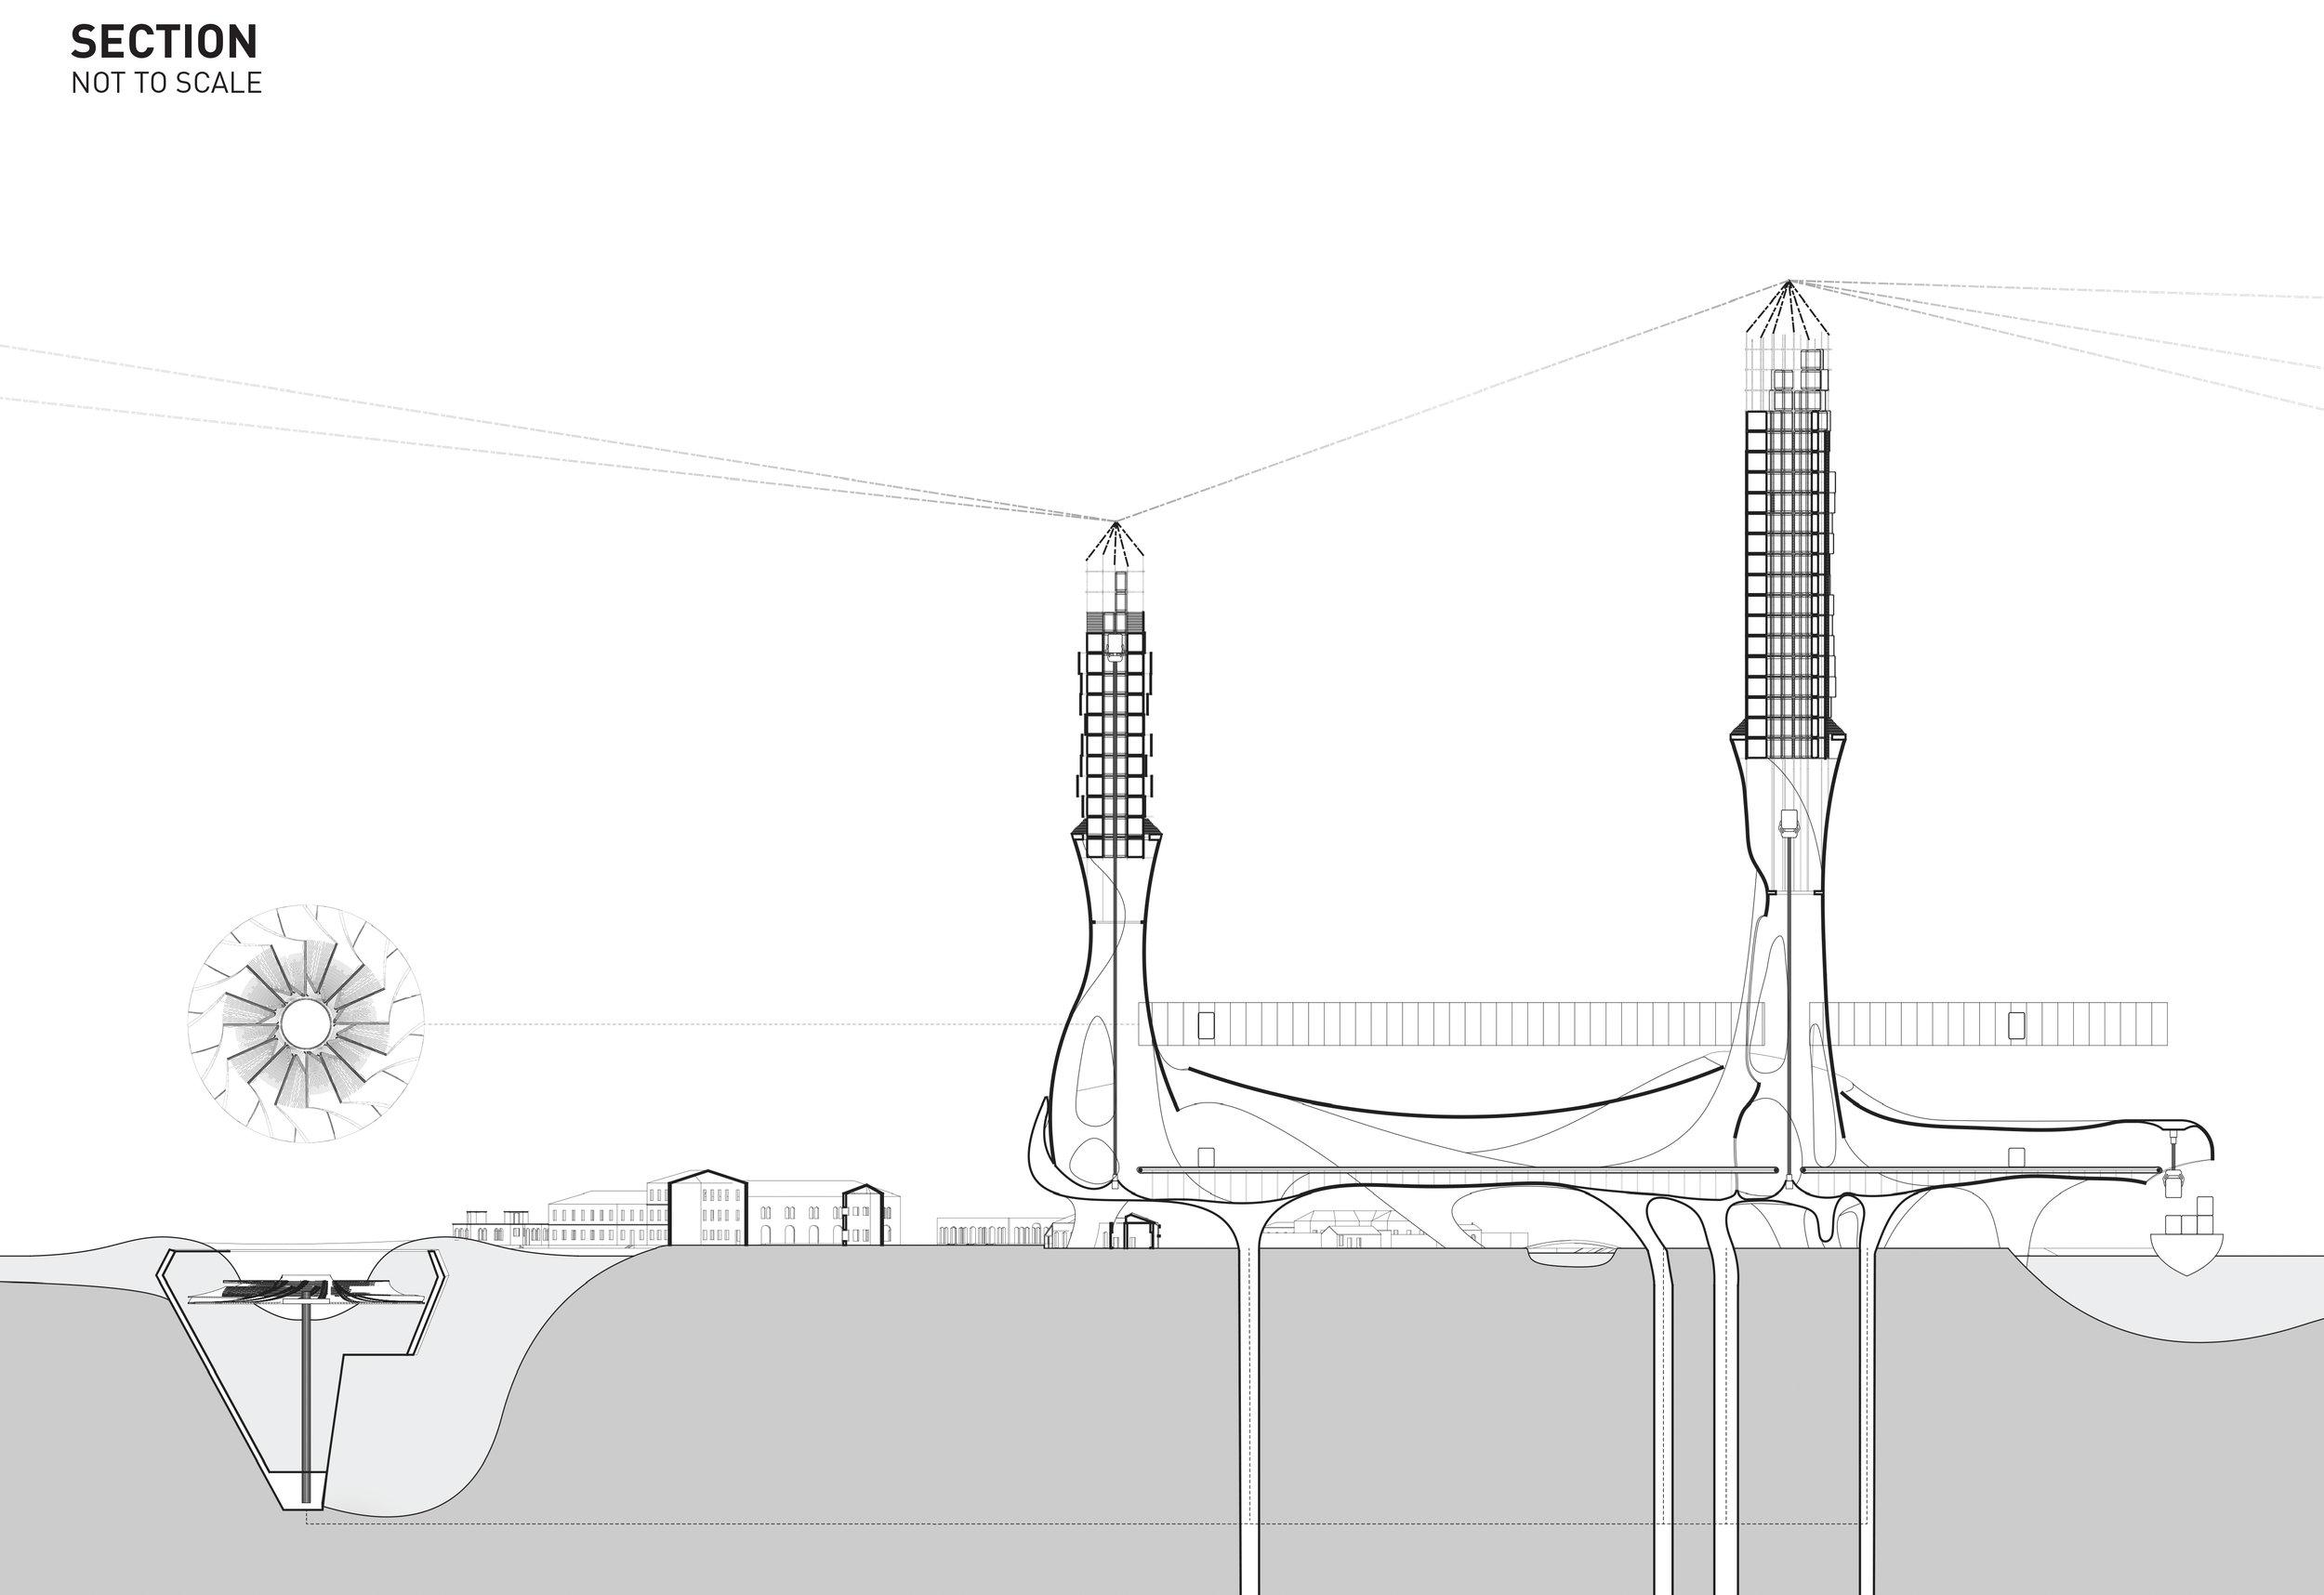 Univeristy Island UNversity Matt Fajkus Architecture MF MFx16_4.jpg